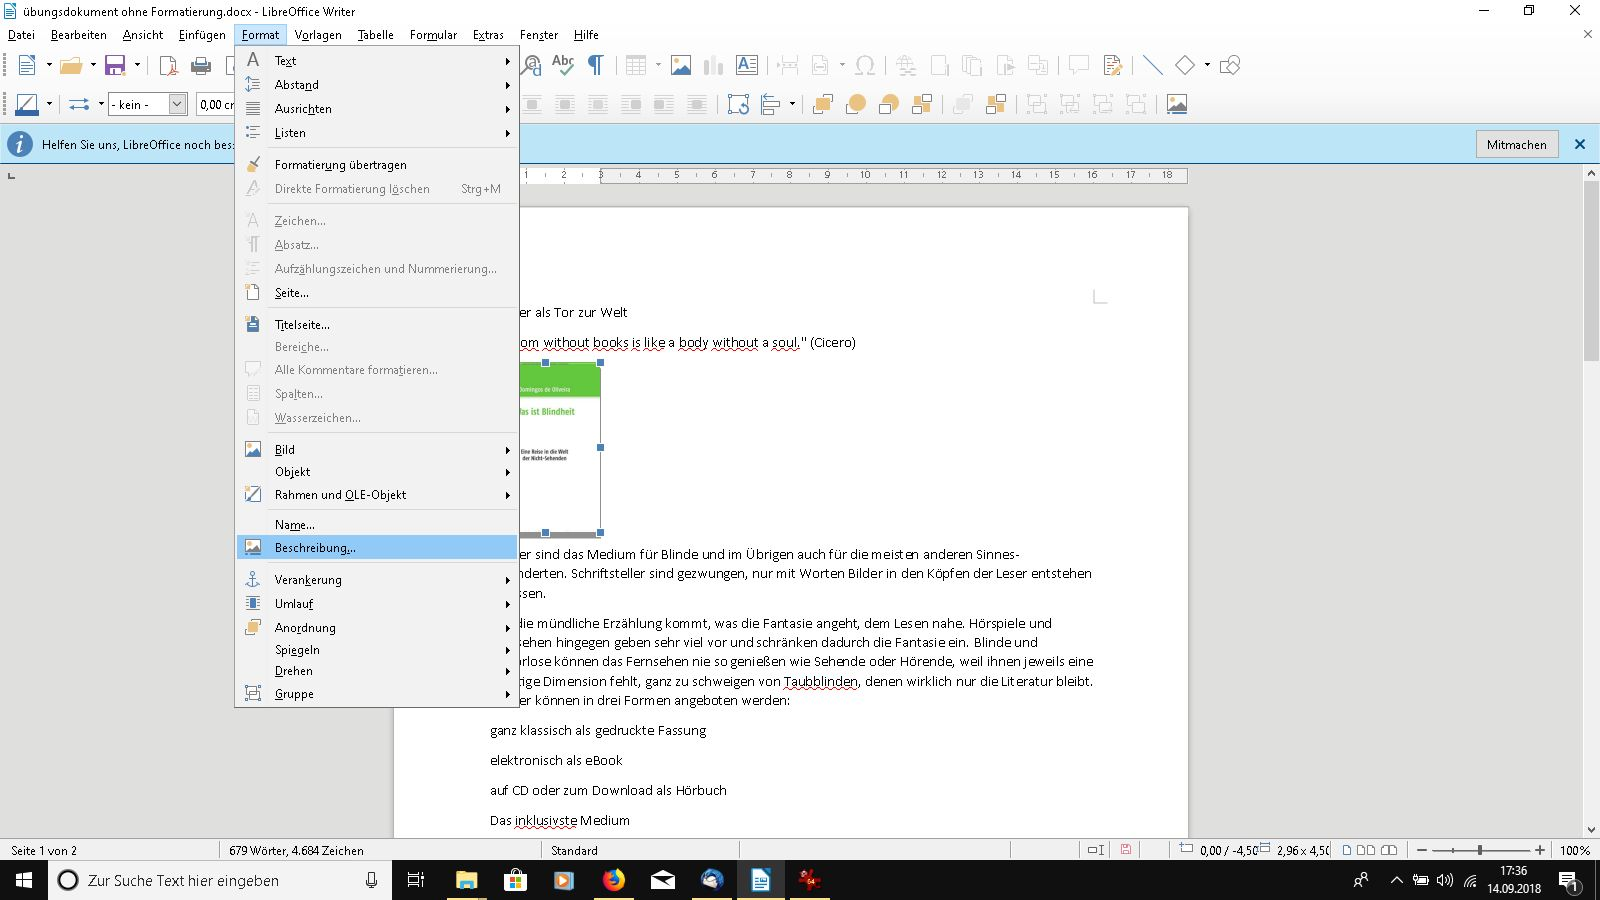 Bildbeschreibung in LibreOffice